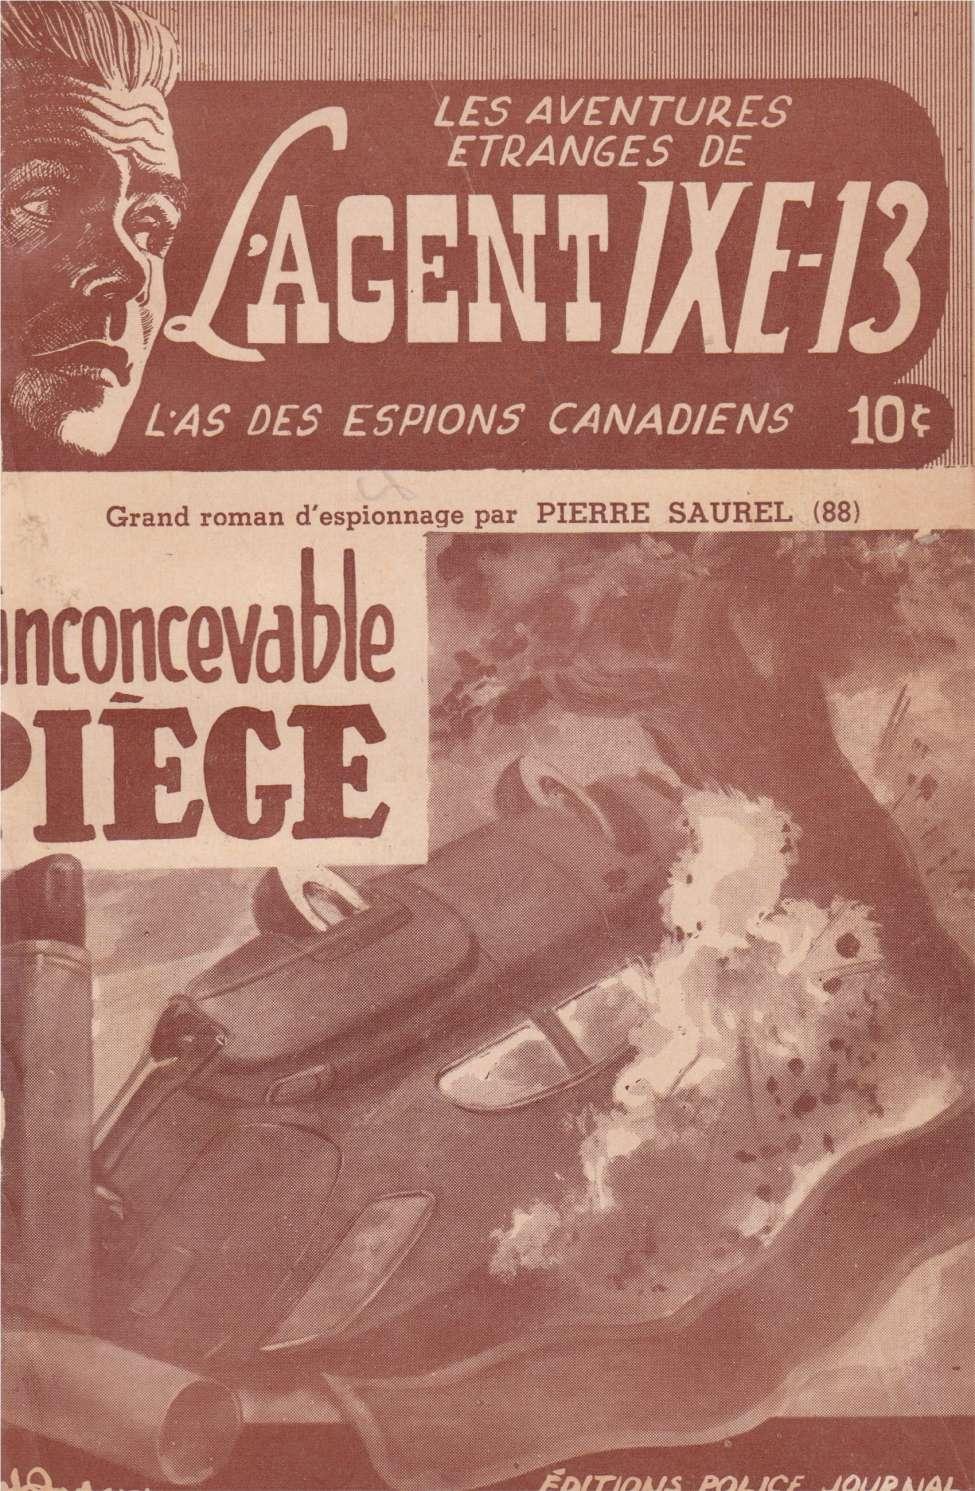 Comic Book Cover For L'Agent IXE-13 v2 088 - L'inconcevable piège